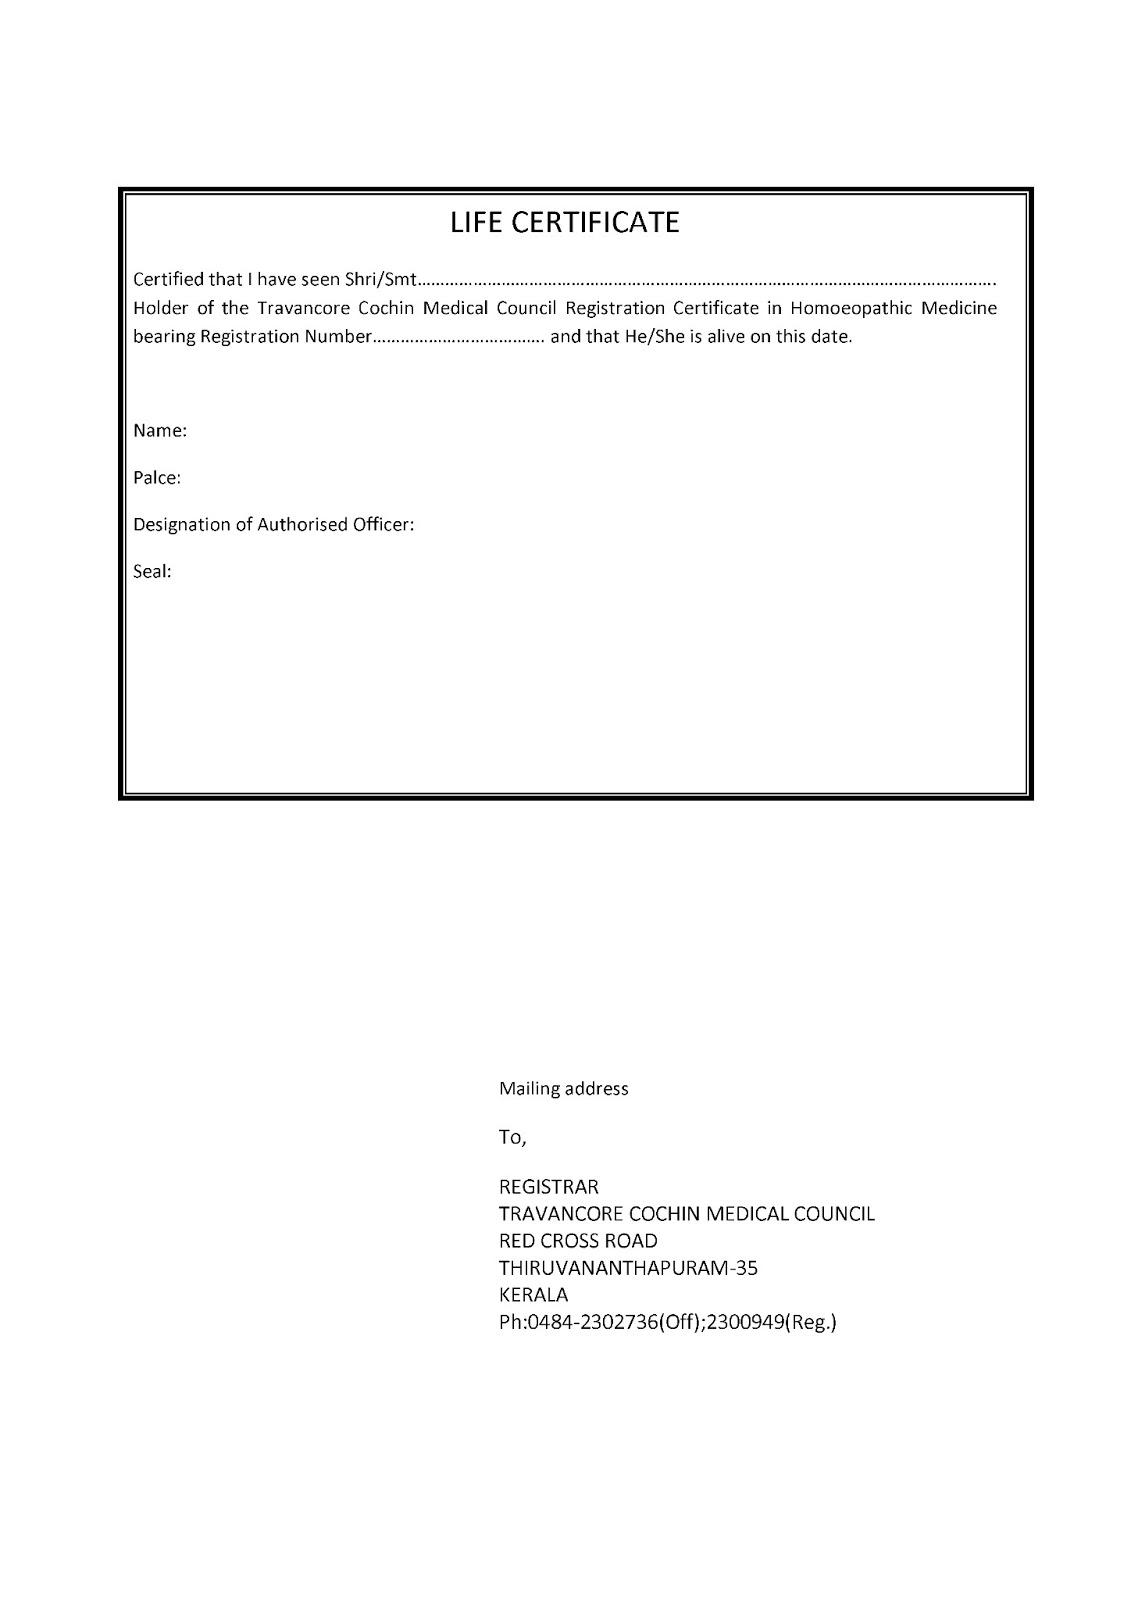 TC Medical council,Kerala-Register update-Urgent |Homoeoscan ...